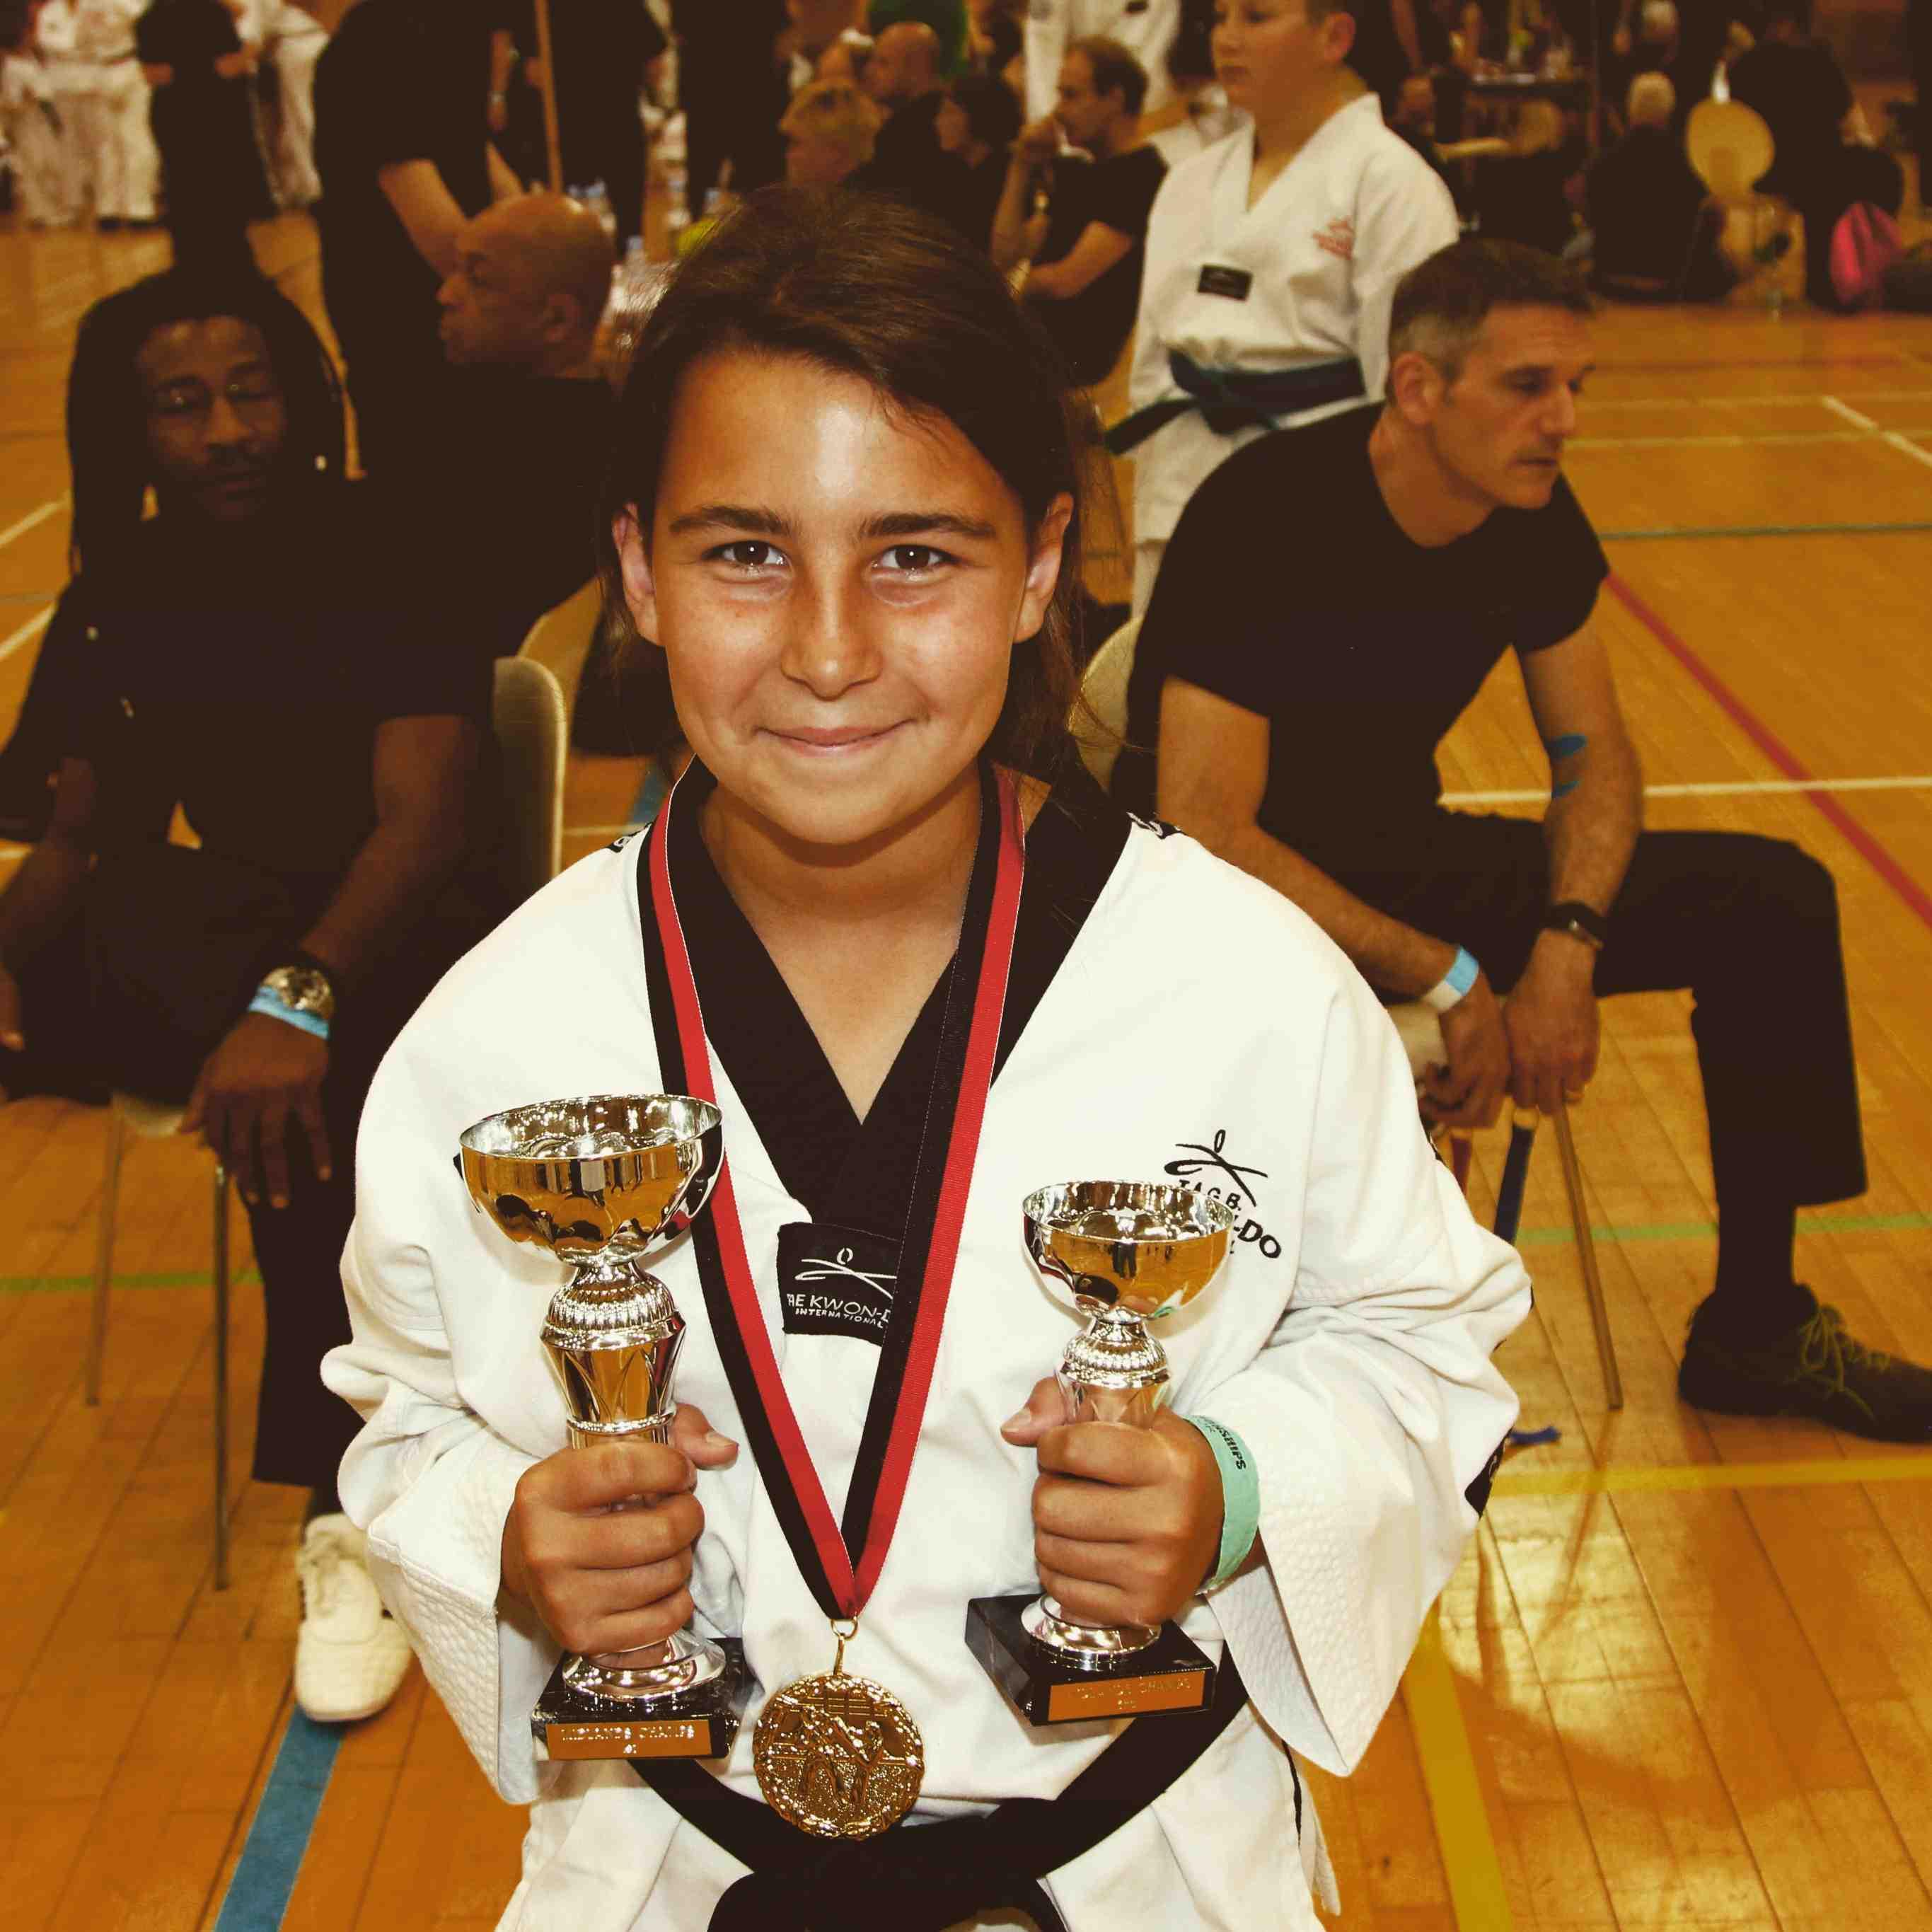 shawna ball martial arts 4 fun taekwondo sport south devon